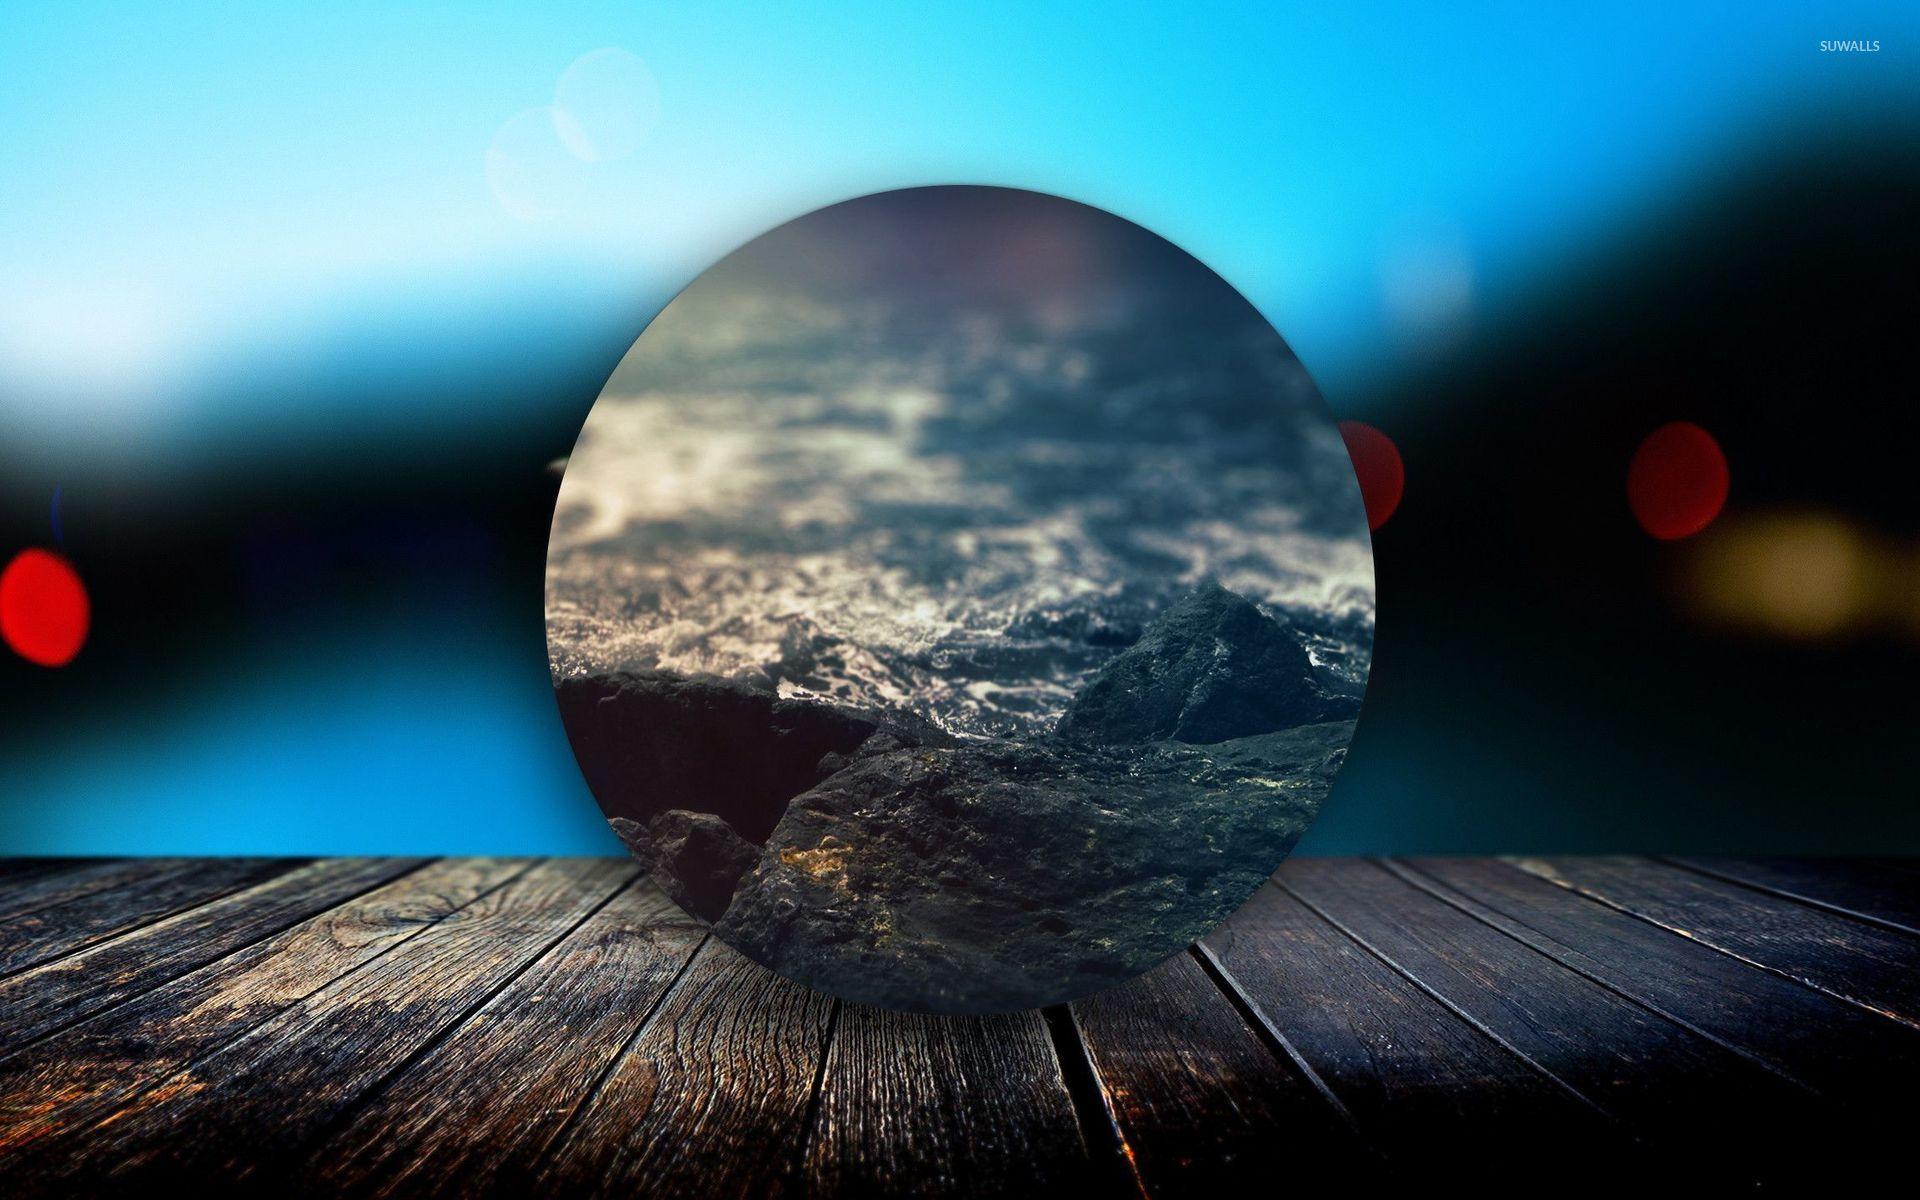 Imagenes Hd 1080p: Circled Beach On The Deck Wallpaper